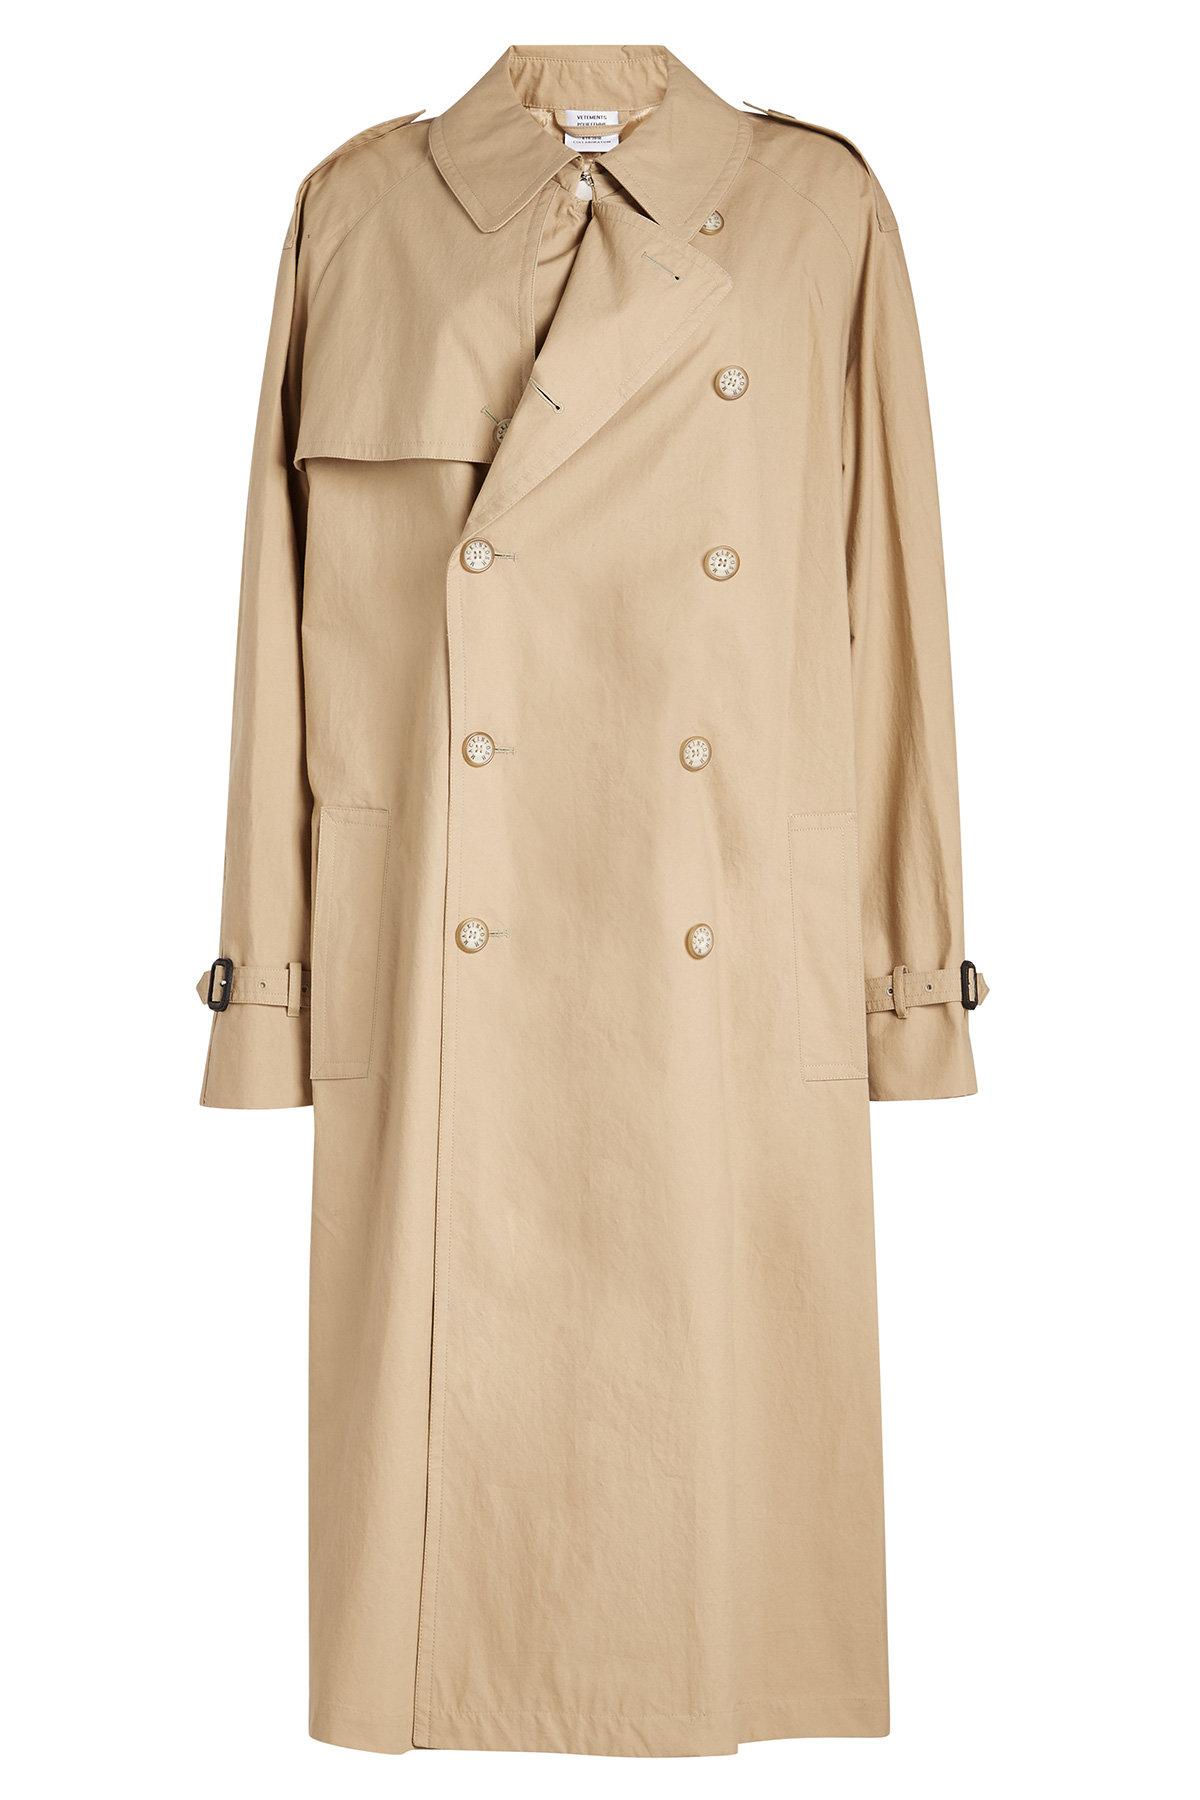 Vetements - x Mackintosh Oversized Trench Coat